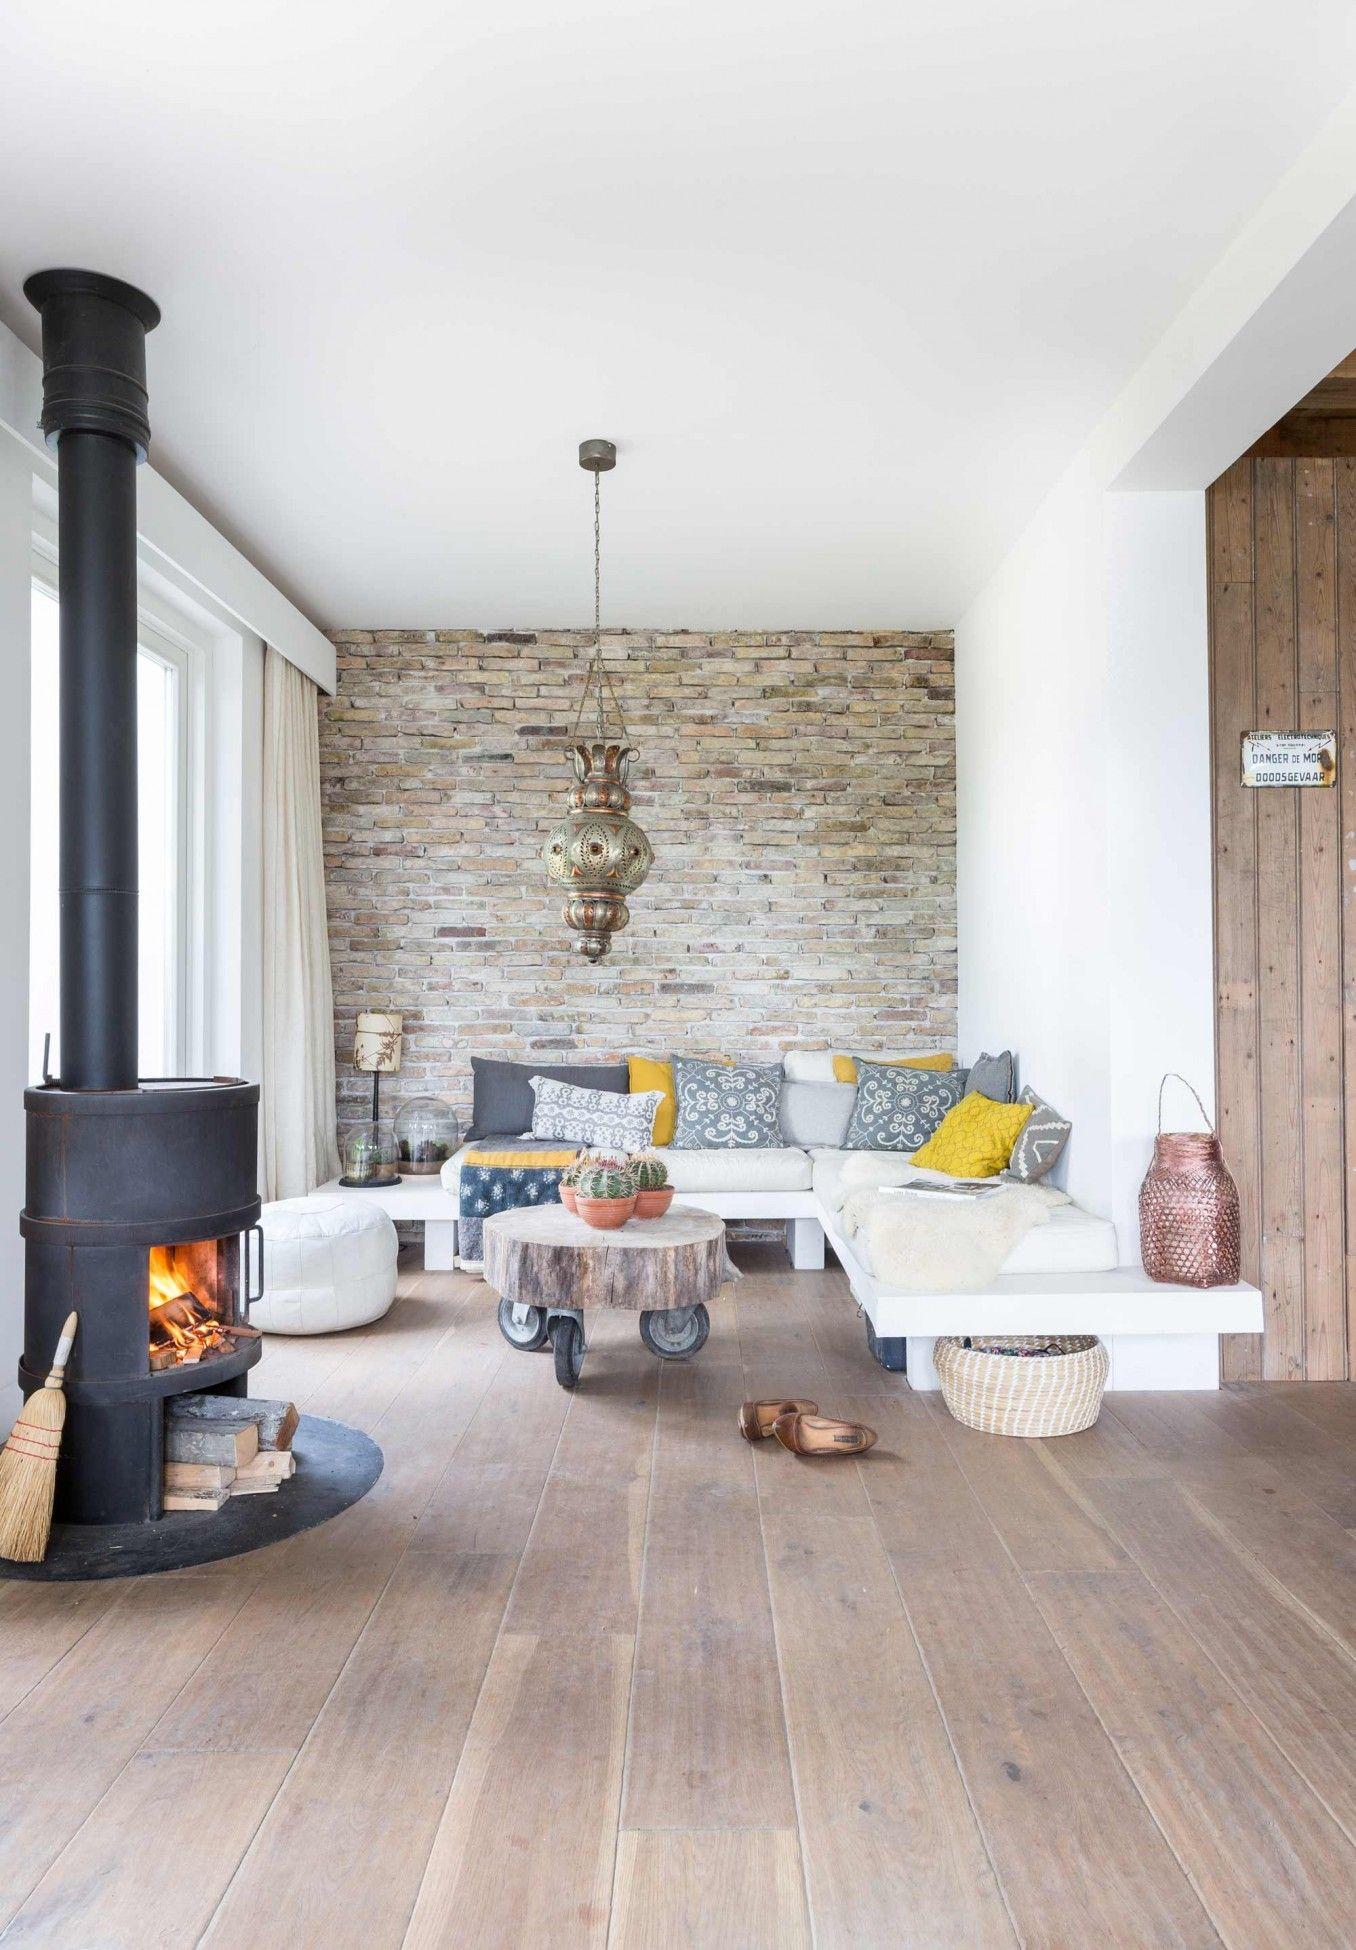 salon ecolo chic mur en pierre parquet clair ecolo chic style living room home. Black Bedroom Furniture Sets. Home Design Ideas